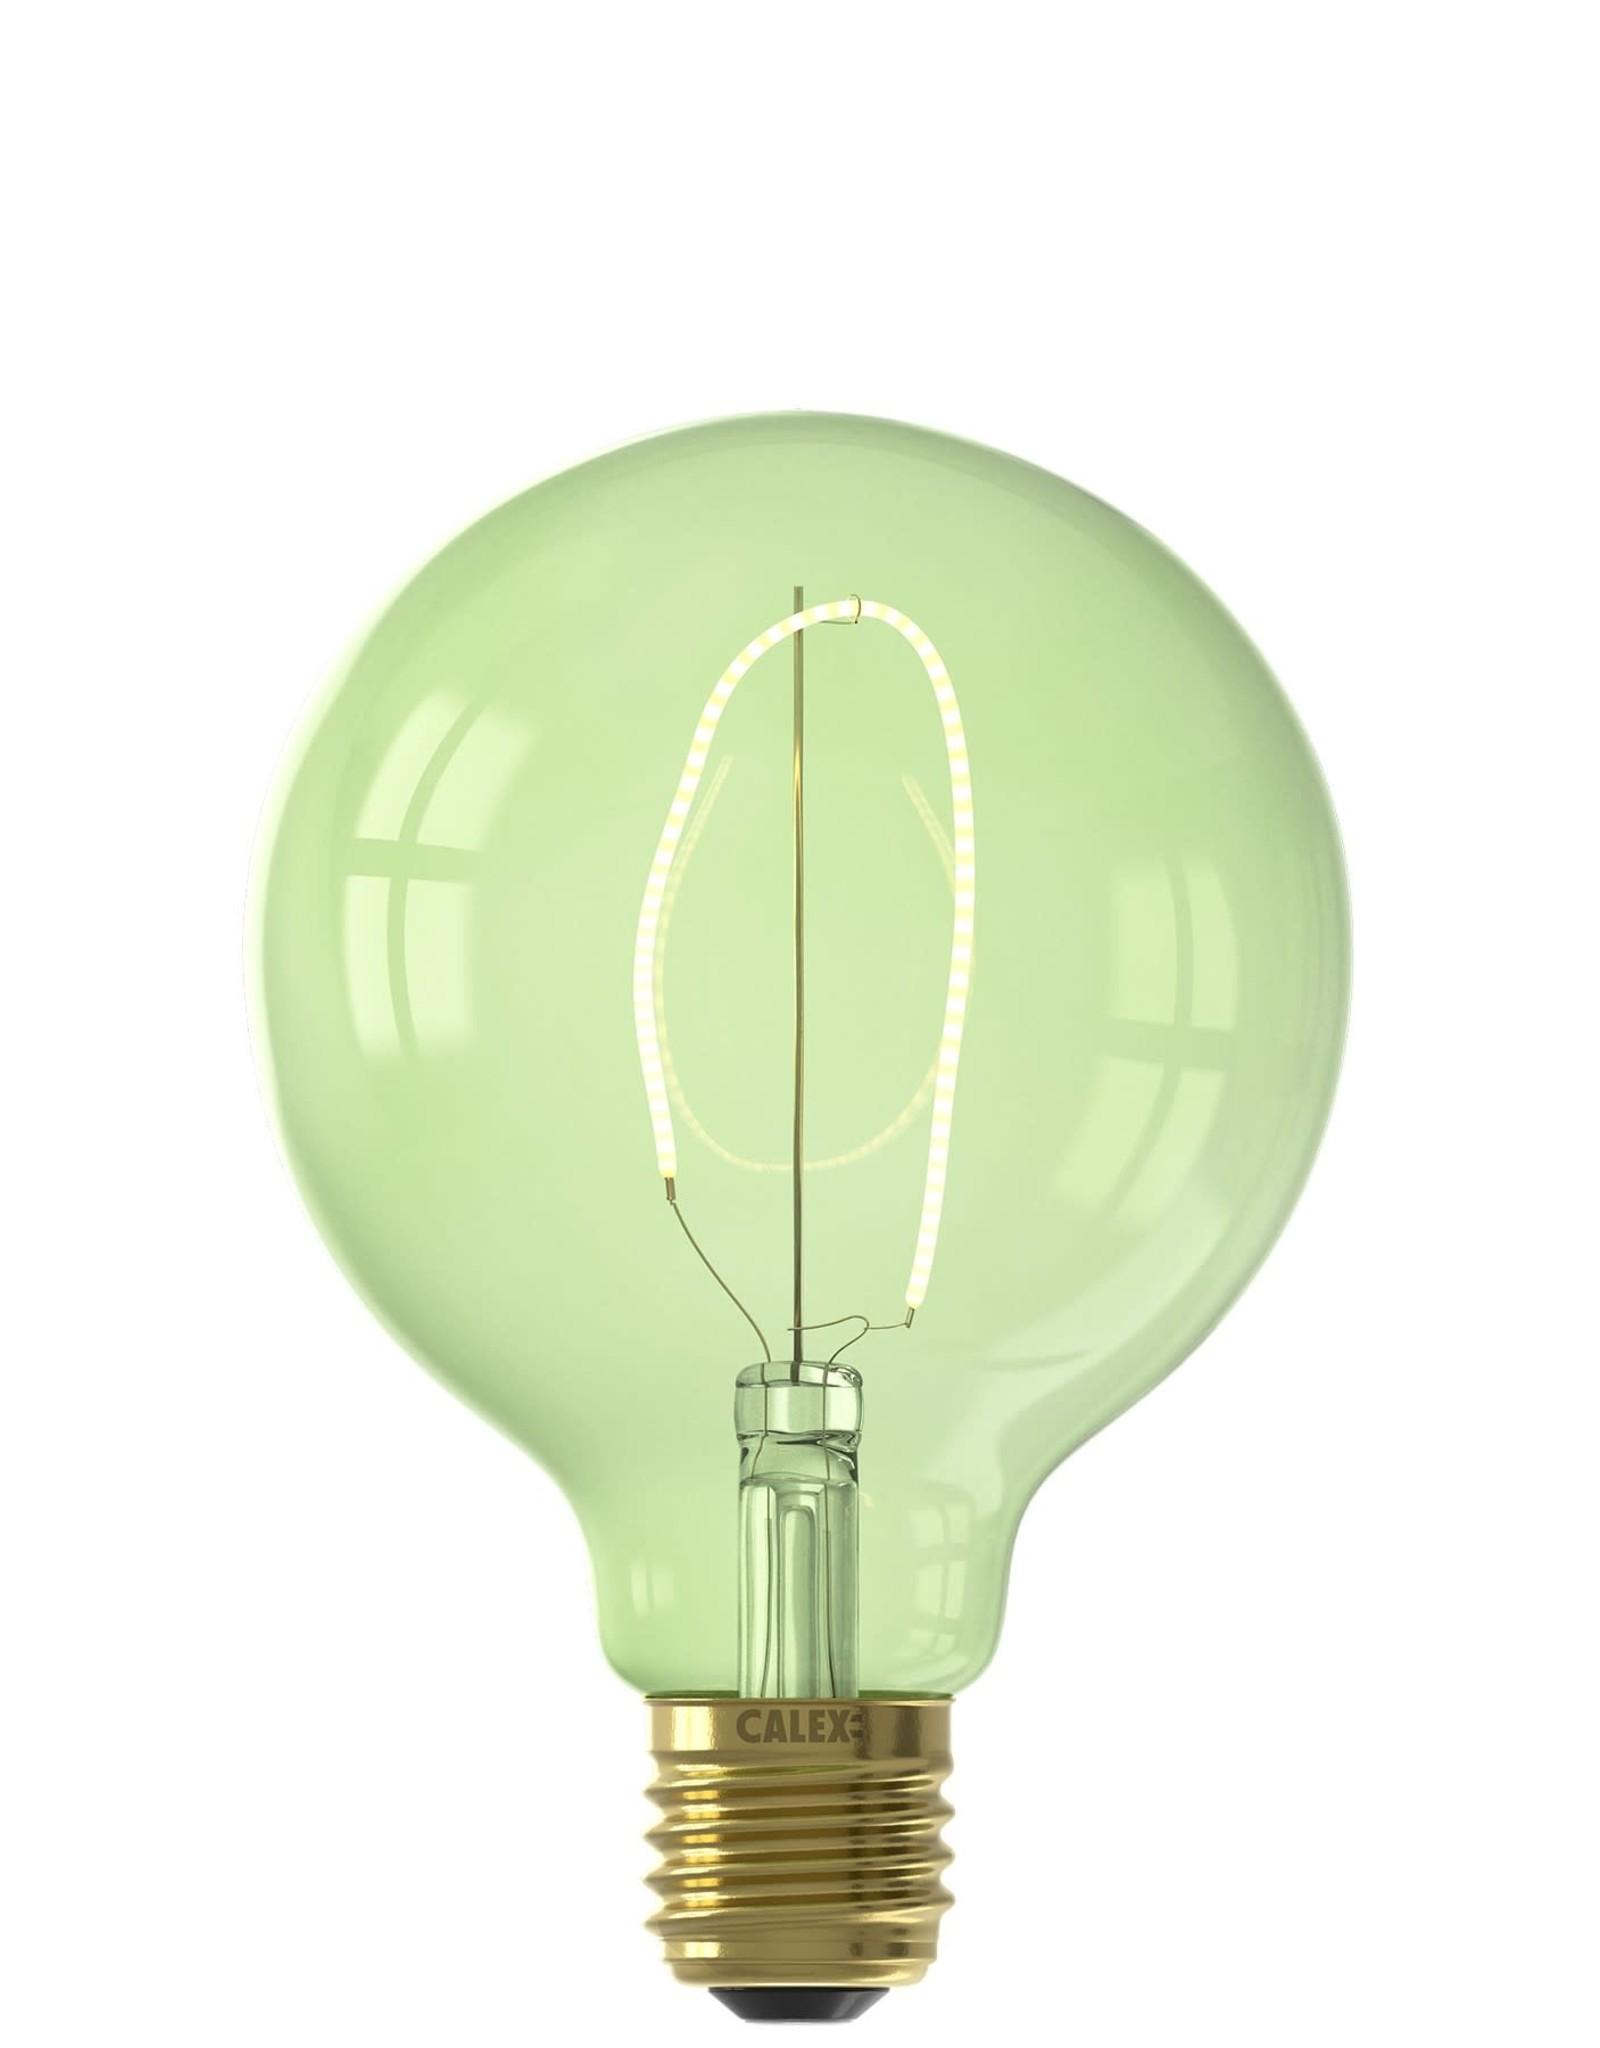 Calex NORA LED colors Globe G95 soft U-filament 220-240V 4W E27, Emerald Green 2200K dimmable, energy label B